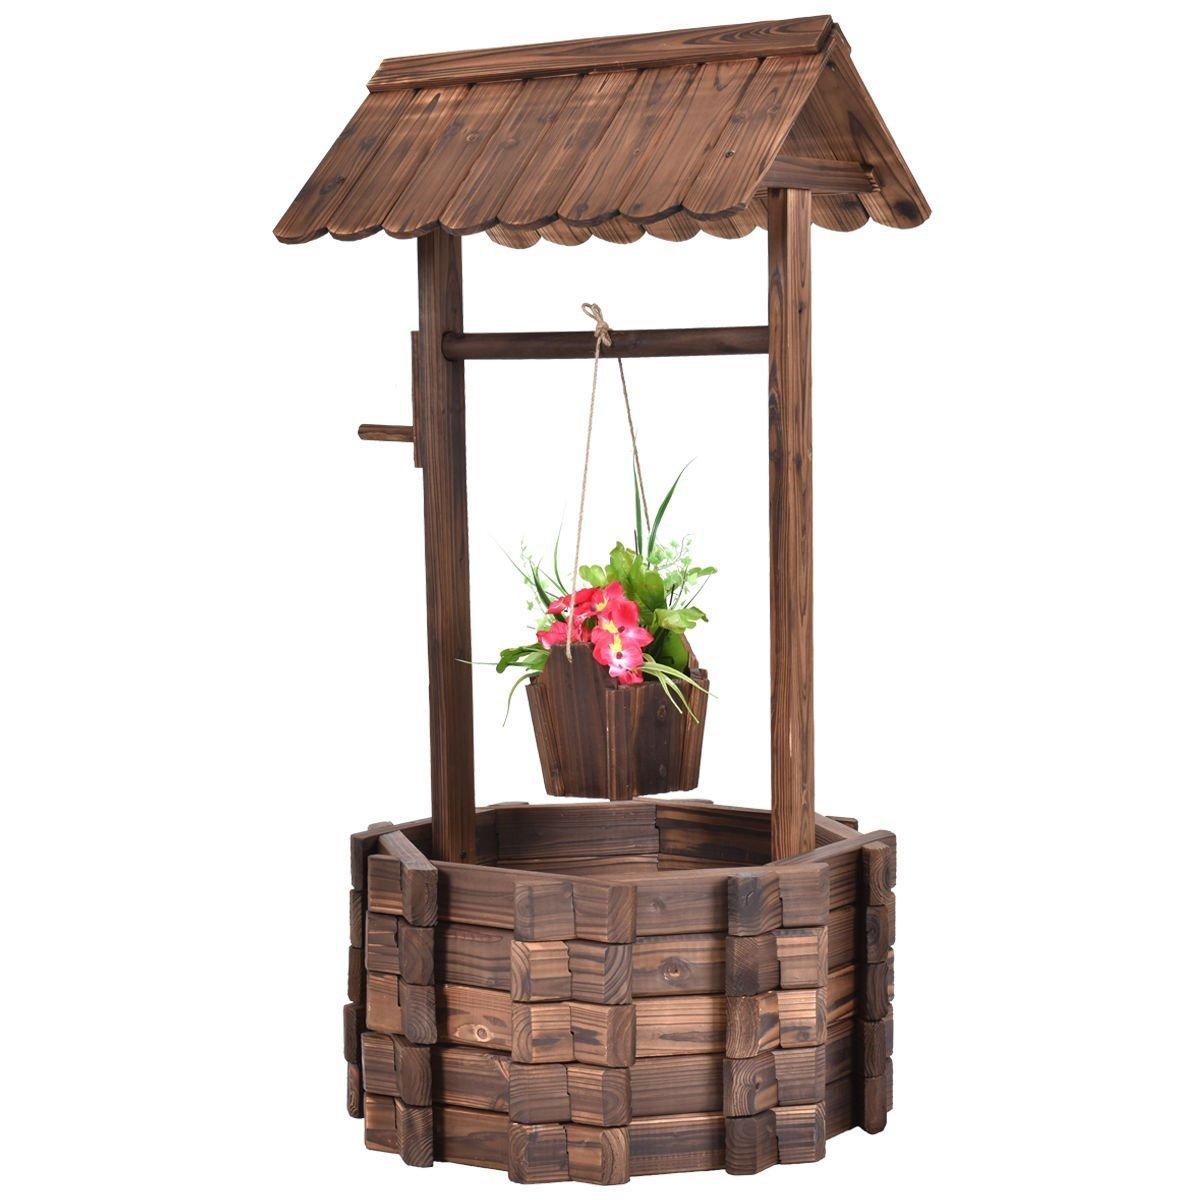 Giantex Outdoor Wooden Wishing Well Bucket Flower Plants Planter Patio Garden Home Decor by Giantex